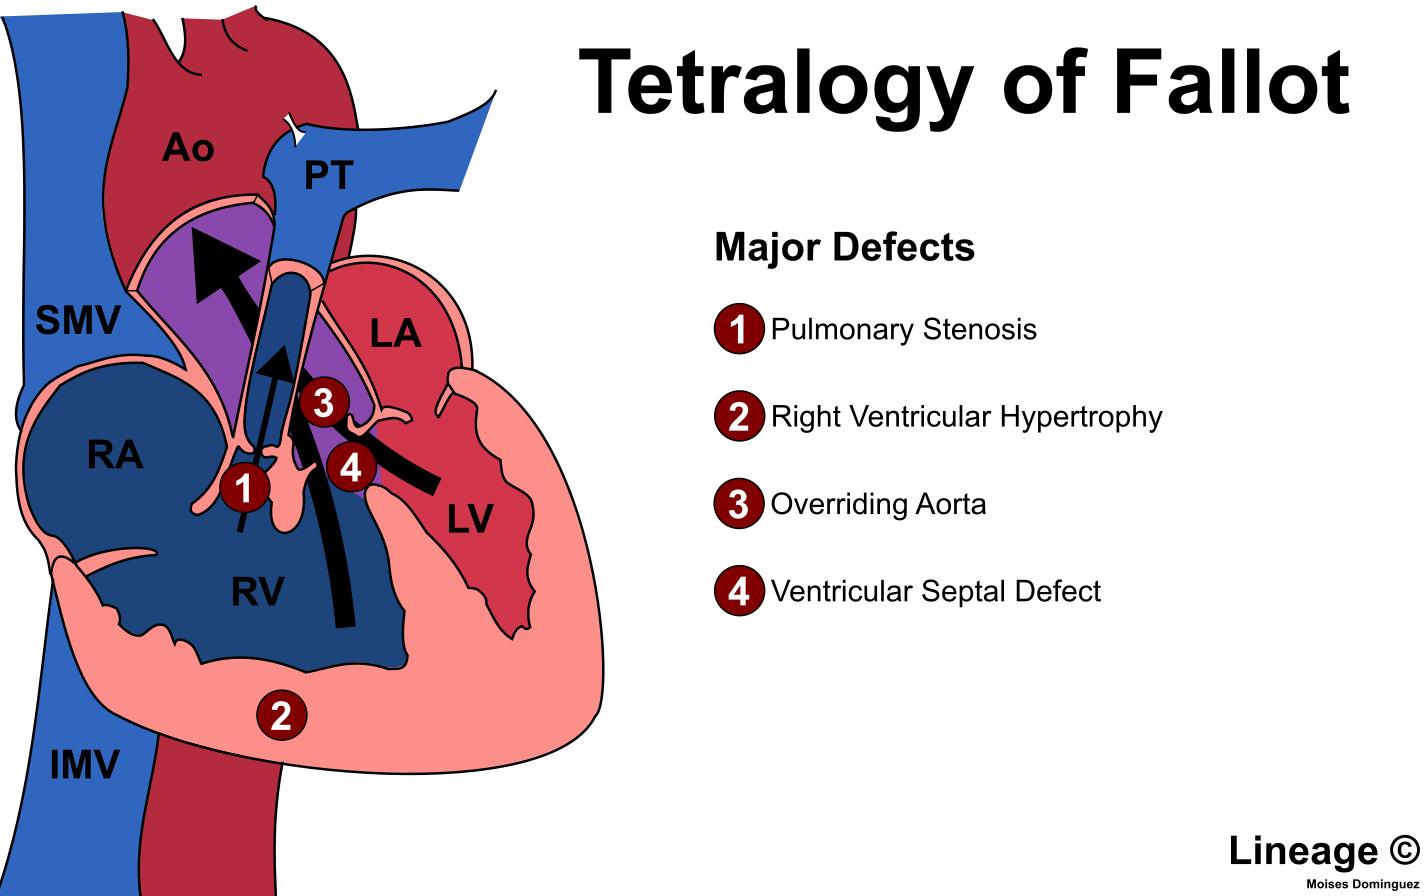 Tetralogy of Fallot - Cardiovascular - Medbullets Step 1 on retinopathy of prematurity pathophysiology, ankylosing spondylitis pathophysiology, bronchiolitis pathophysiology, pleural effusion pathophysiology, unstable angina pathophysiology, mitral valve stenosis pathophysiology, cushing's syndrome pathophysiology, meningitis pathophysiology, nephrotic syndrome pathophysiology, aspiration pneumonia pathophysiology, cardiac tamponade pathophysiology, typhoid fever pathophysiology, sarcoidosis pathophysiology, atrial flutter pathophysiology, umbilical hernia pathophysiology, alzheimer's disease pathophysiology, chronic obstructive pulmonary disease pathophysiology, mitral valve regurgitation pathophysiology, aortic stenosis pathophysiology, cardiogenic shock pathophysiology,